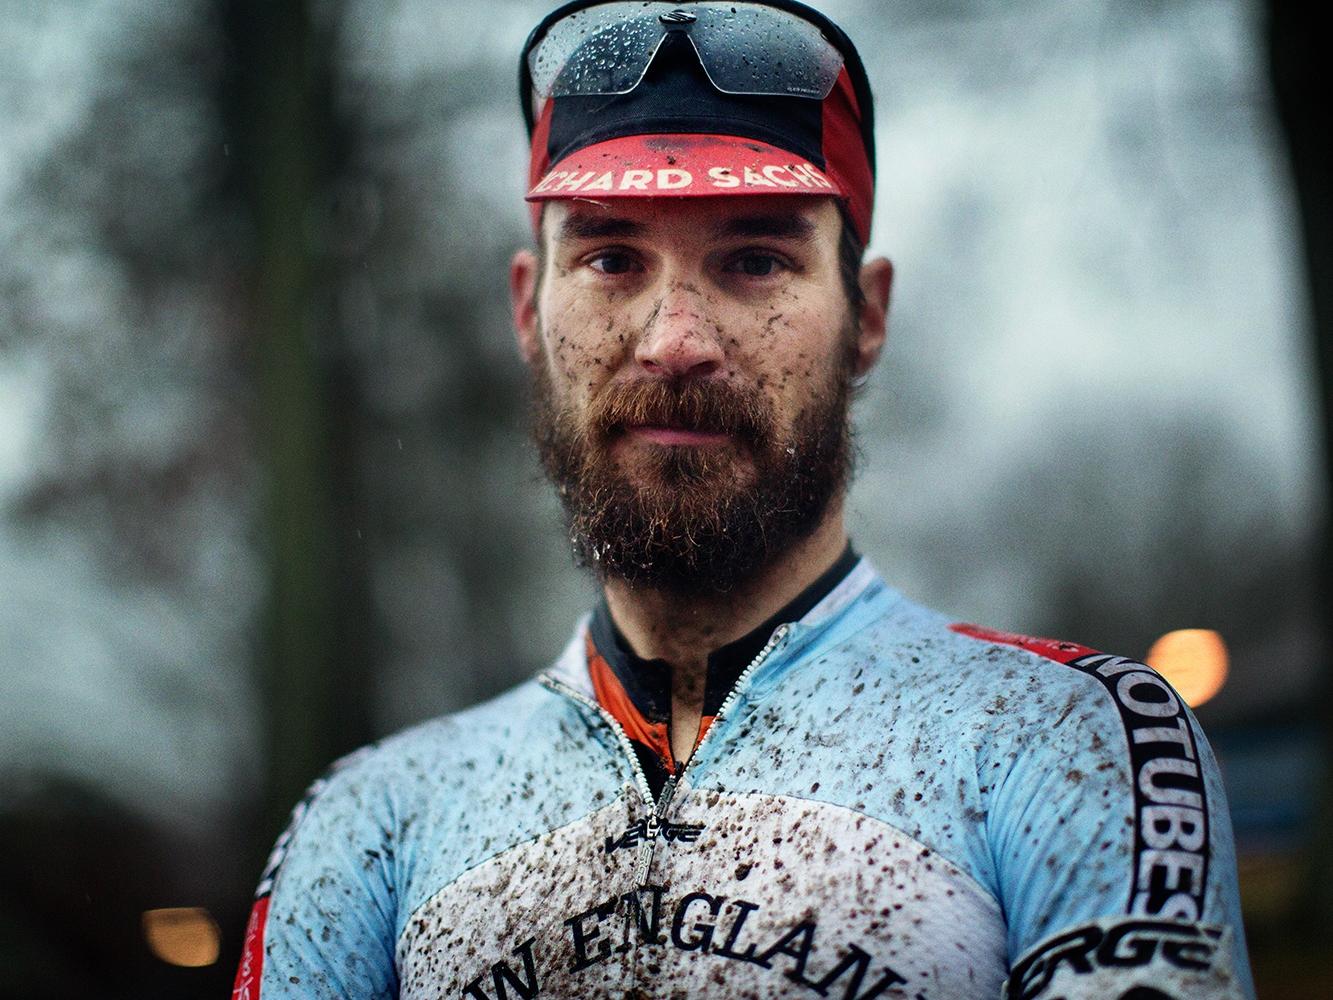 NBX Grand Prix of Cyclocross, Rhode Island